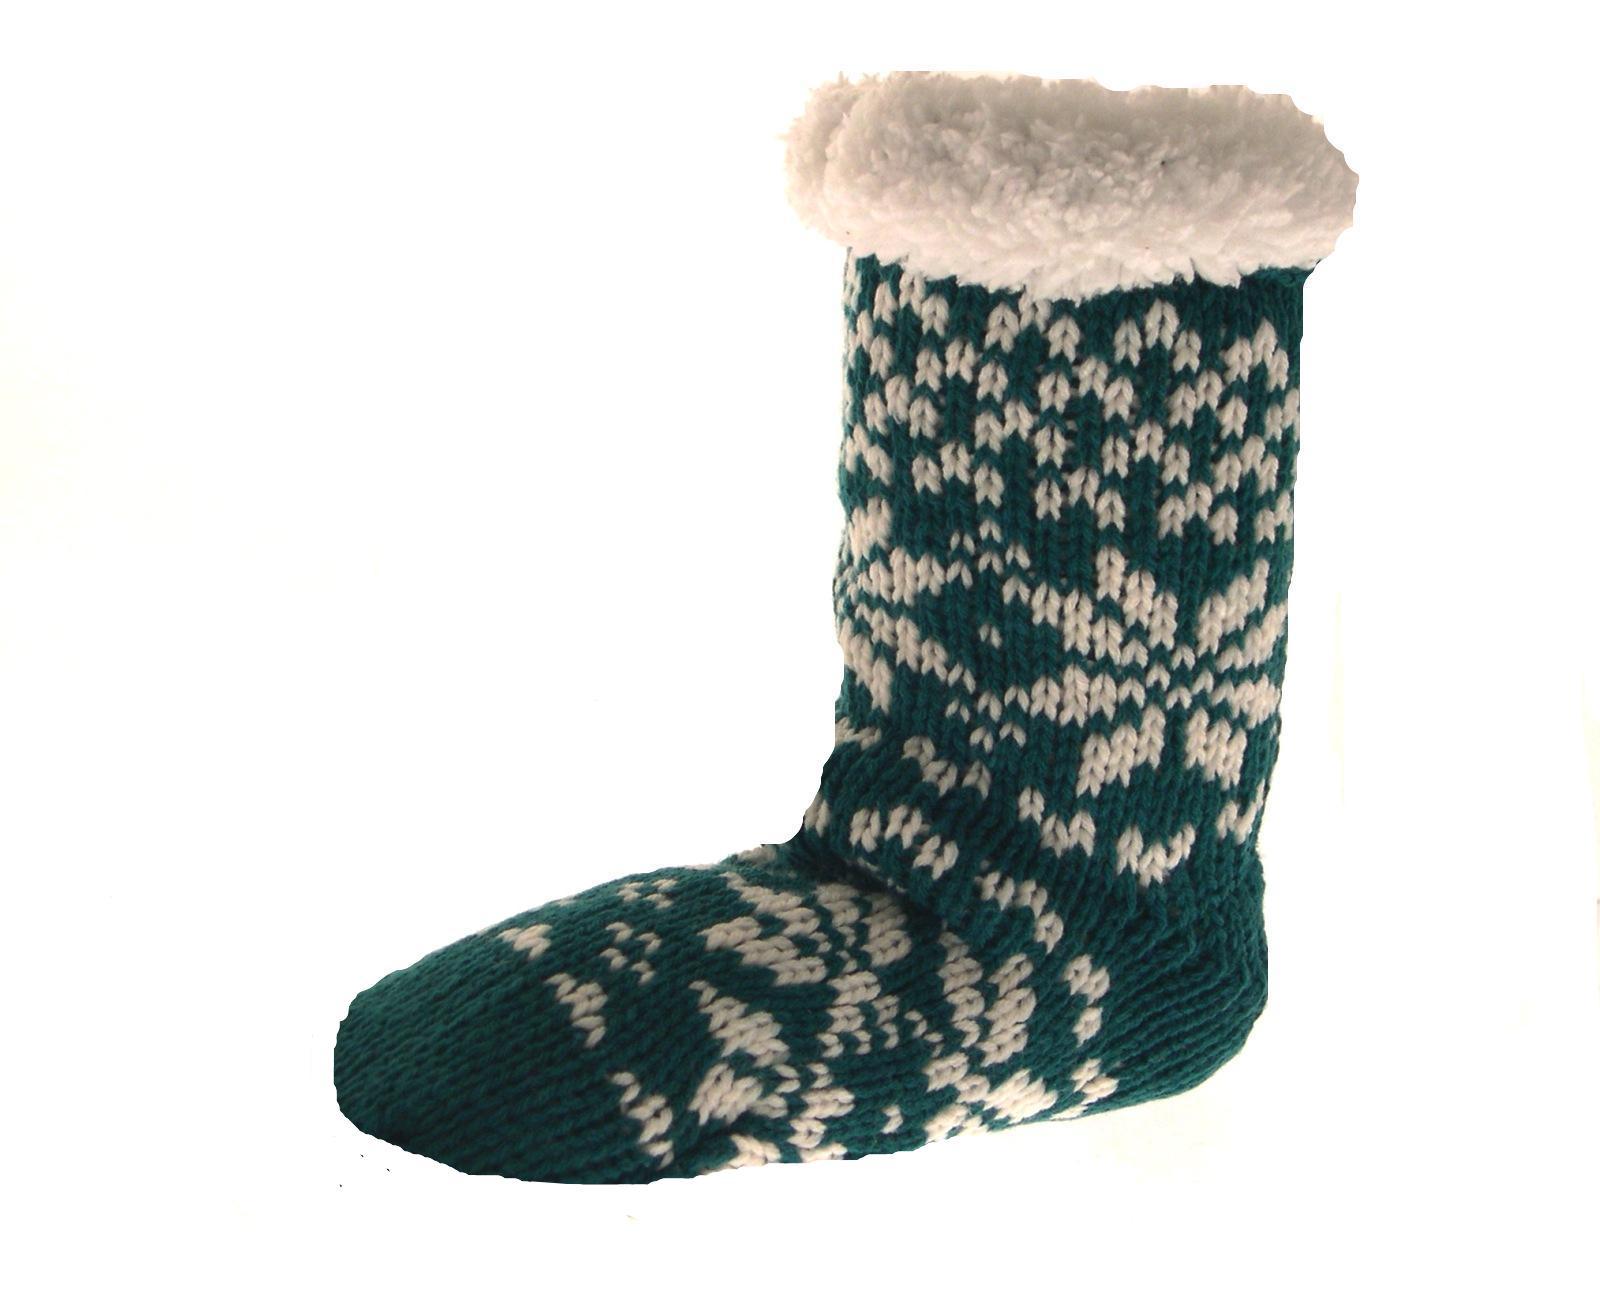 Womens Ladies Girls Kids Fur Lined Slipper Socks Ankle Boots Booties Size UK 4-7 | EBay